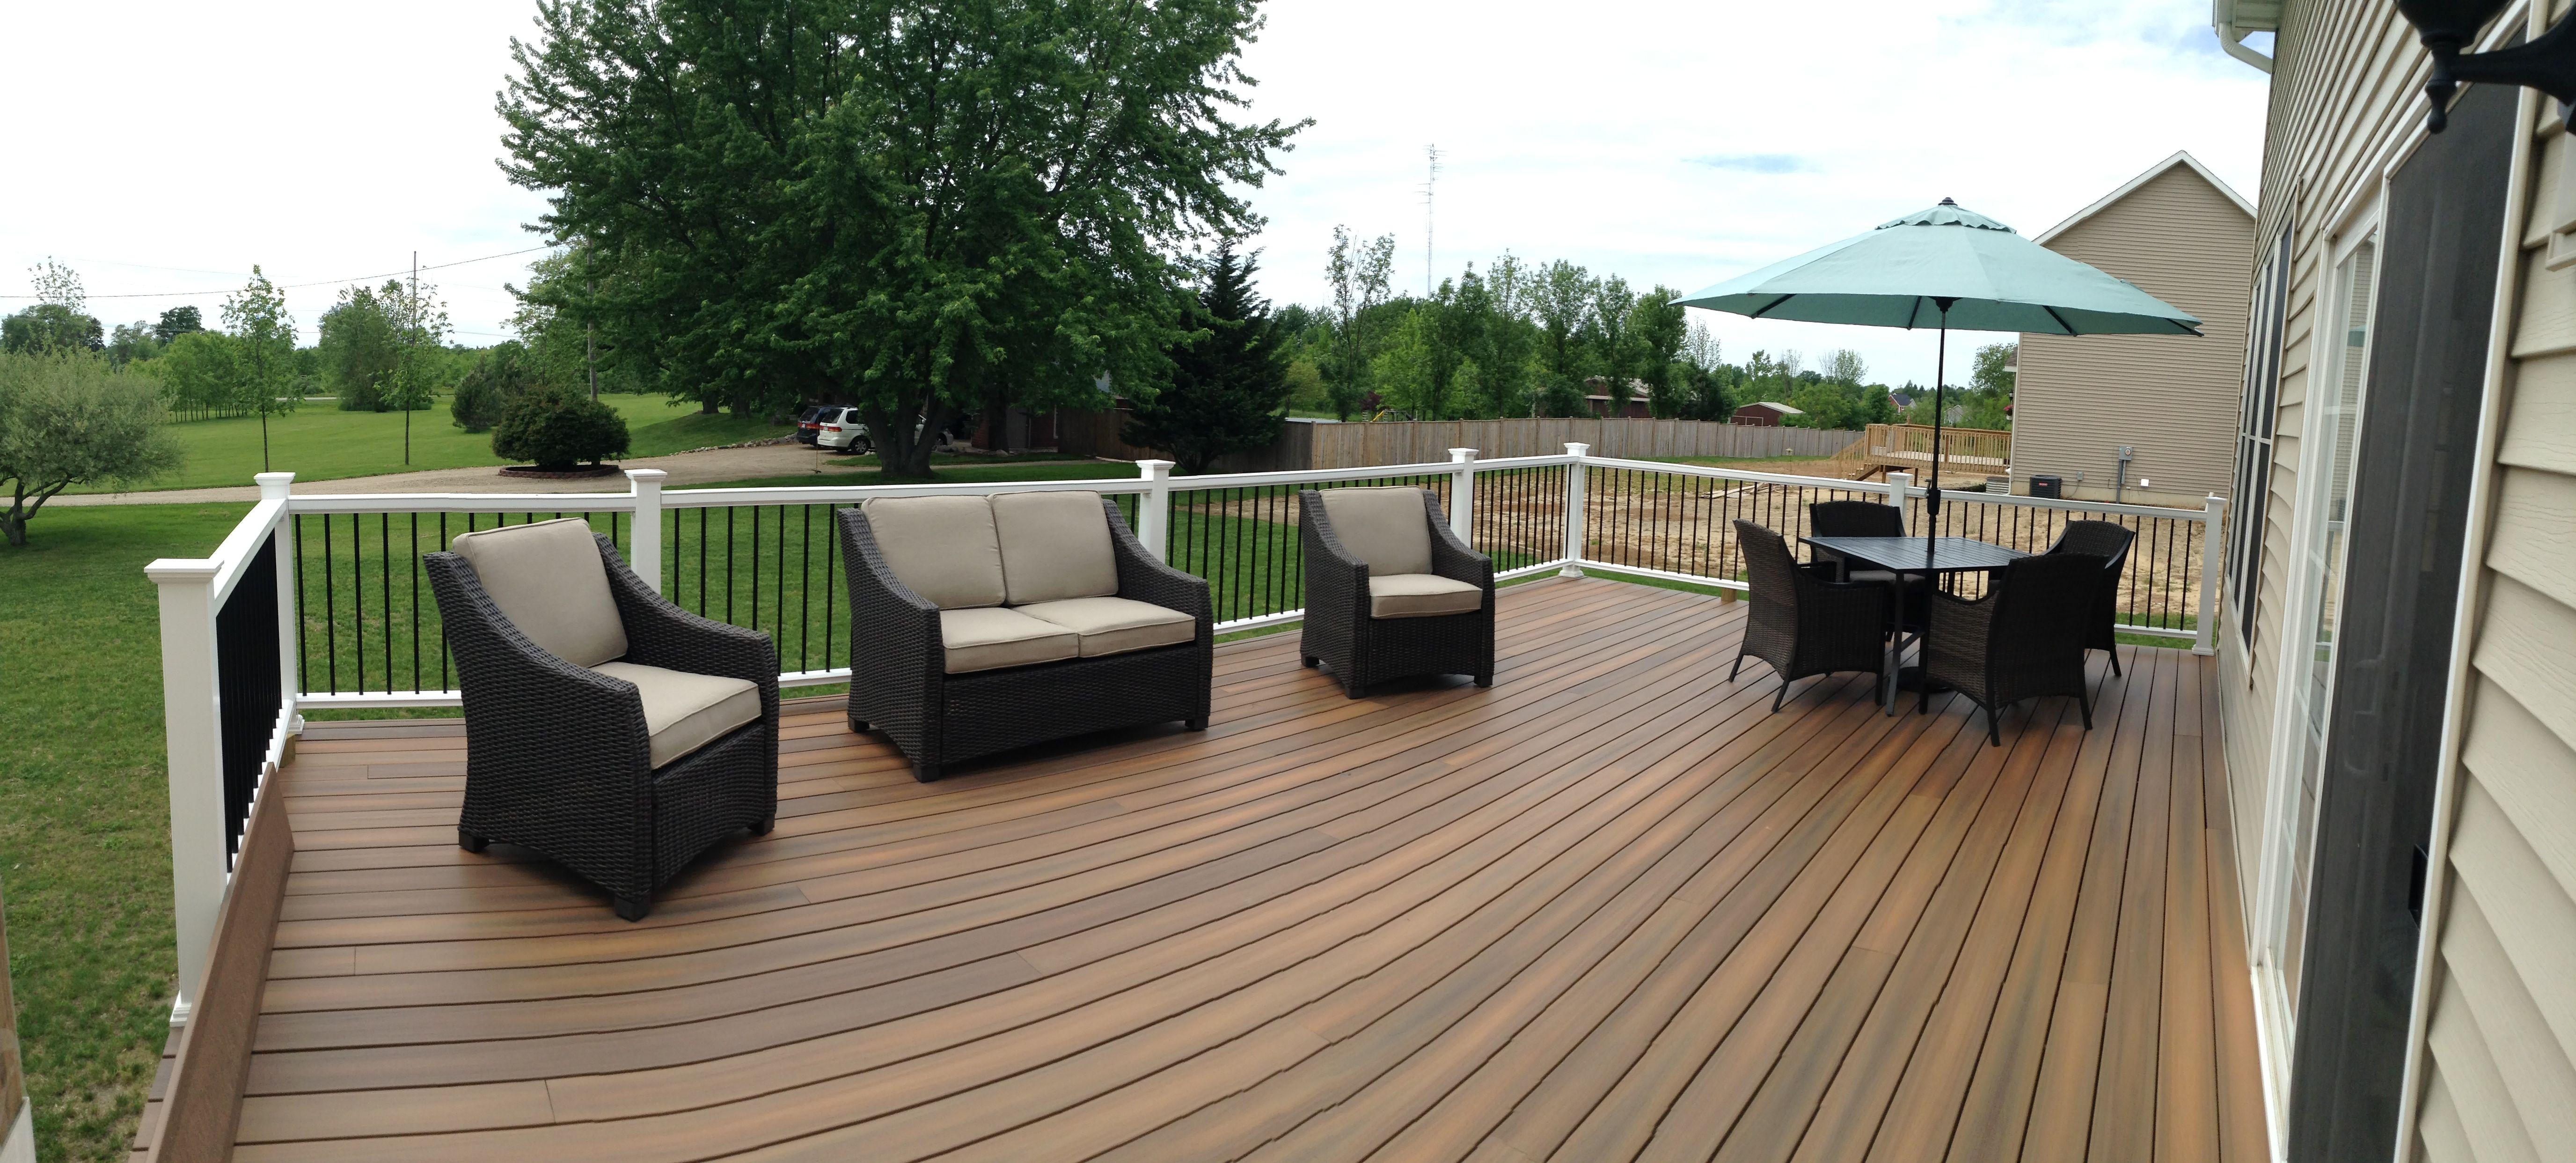 Fiberon horizon ipe deck i love my deck decks for Horizon composite decking